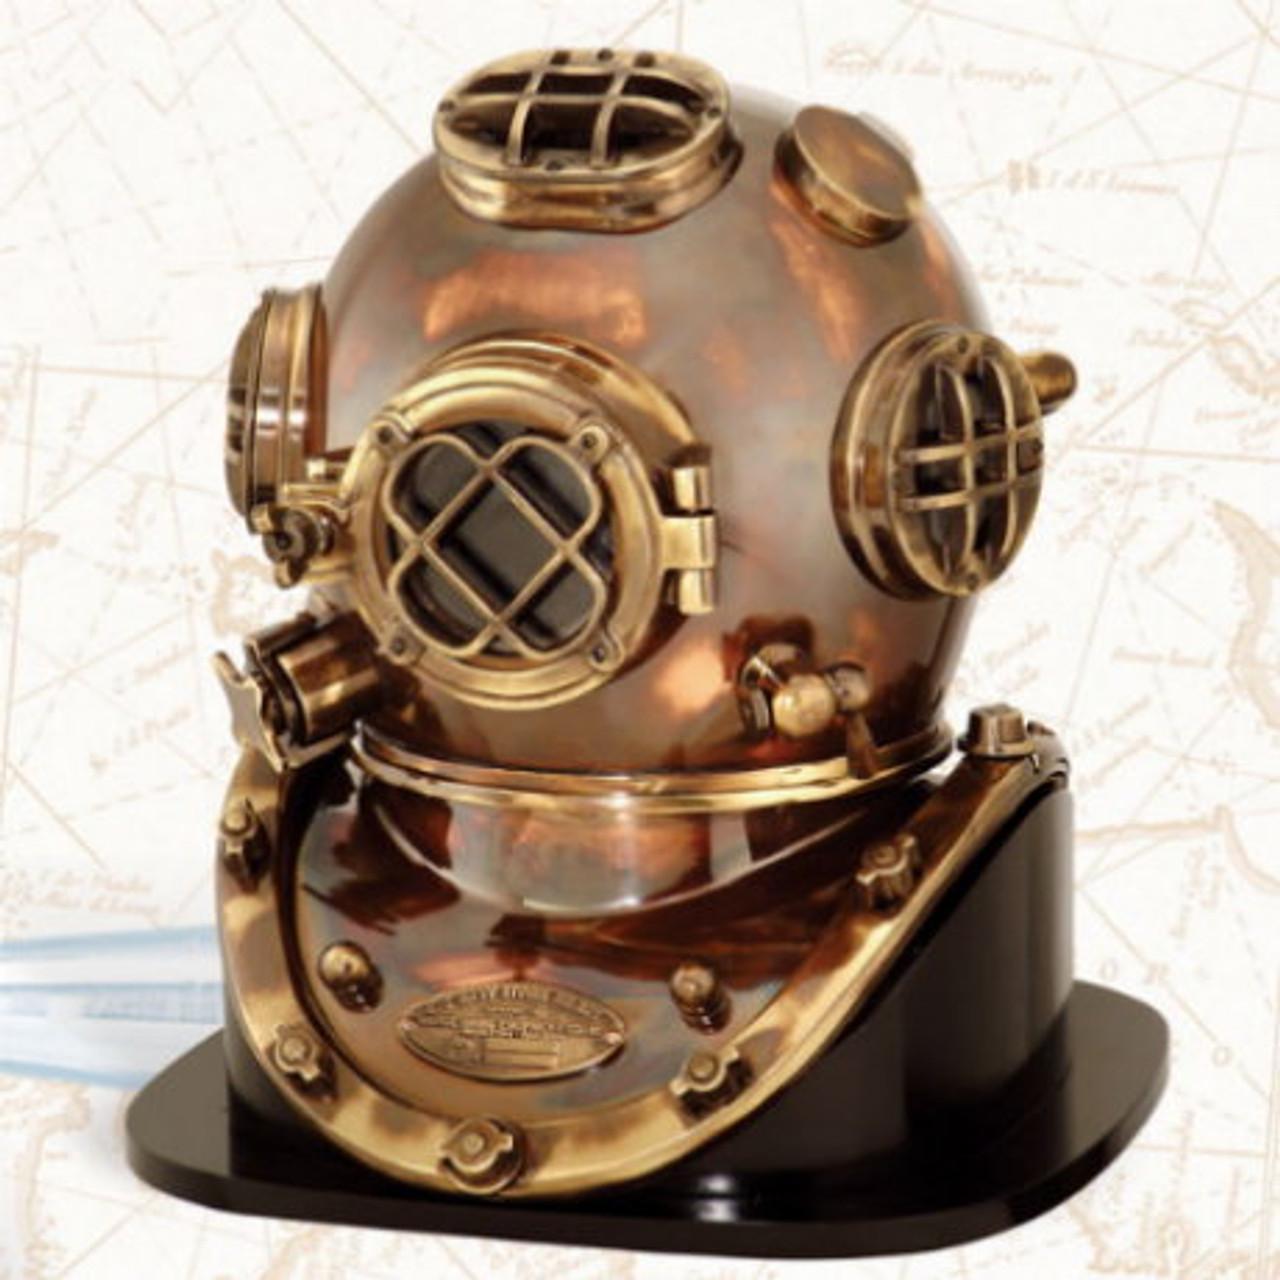 Antique Nautical Brass Diving Divers Helmet U.S Navy Mark